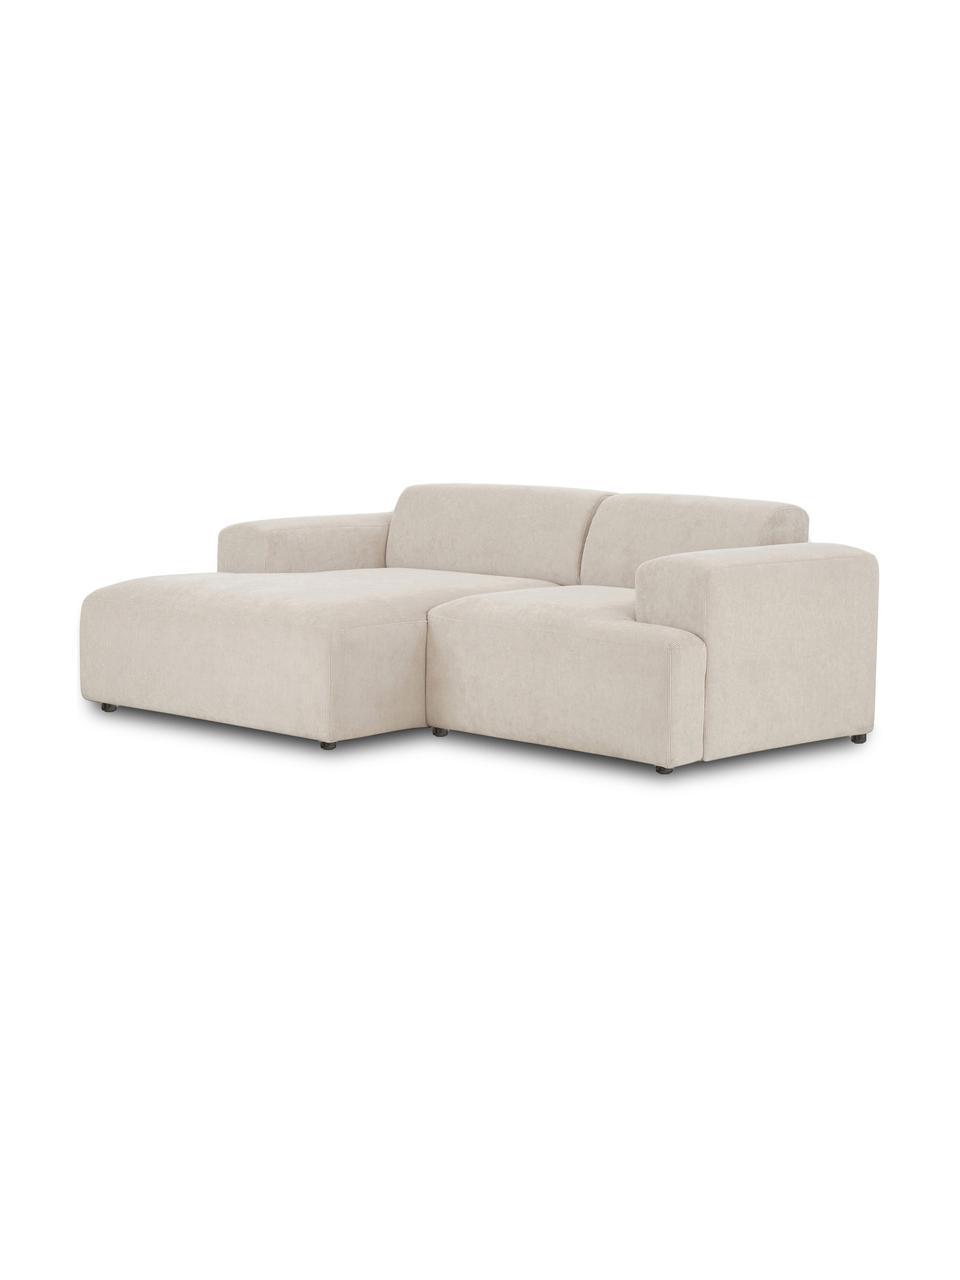 Cord-Ecksofa Melva (3-Sitzer) in Beige, Bezug: Cord (92% Polyester, 8% P, Gestell: Massives Kiefernholz, FSC, Füße: Kunststoff, Cord Beige, B 239 x T 143 cm